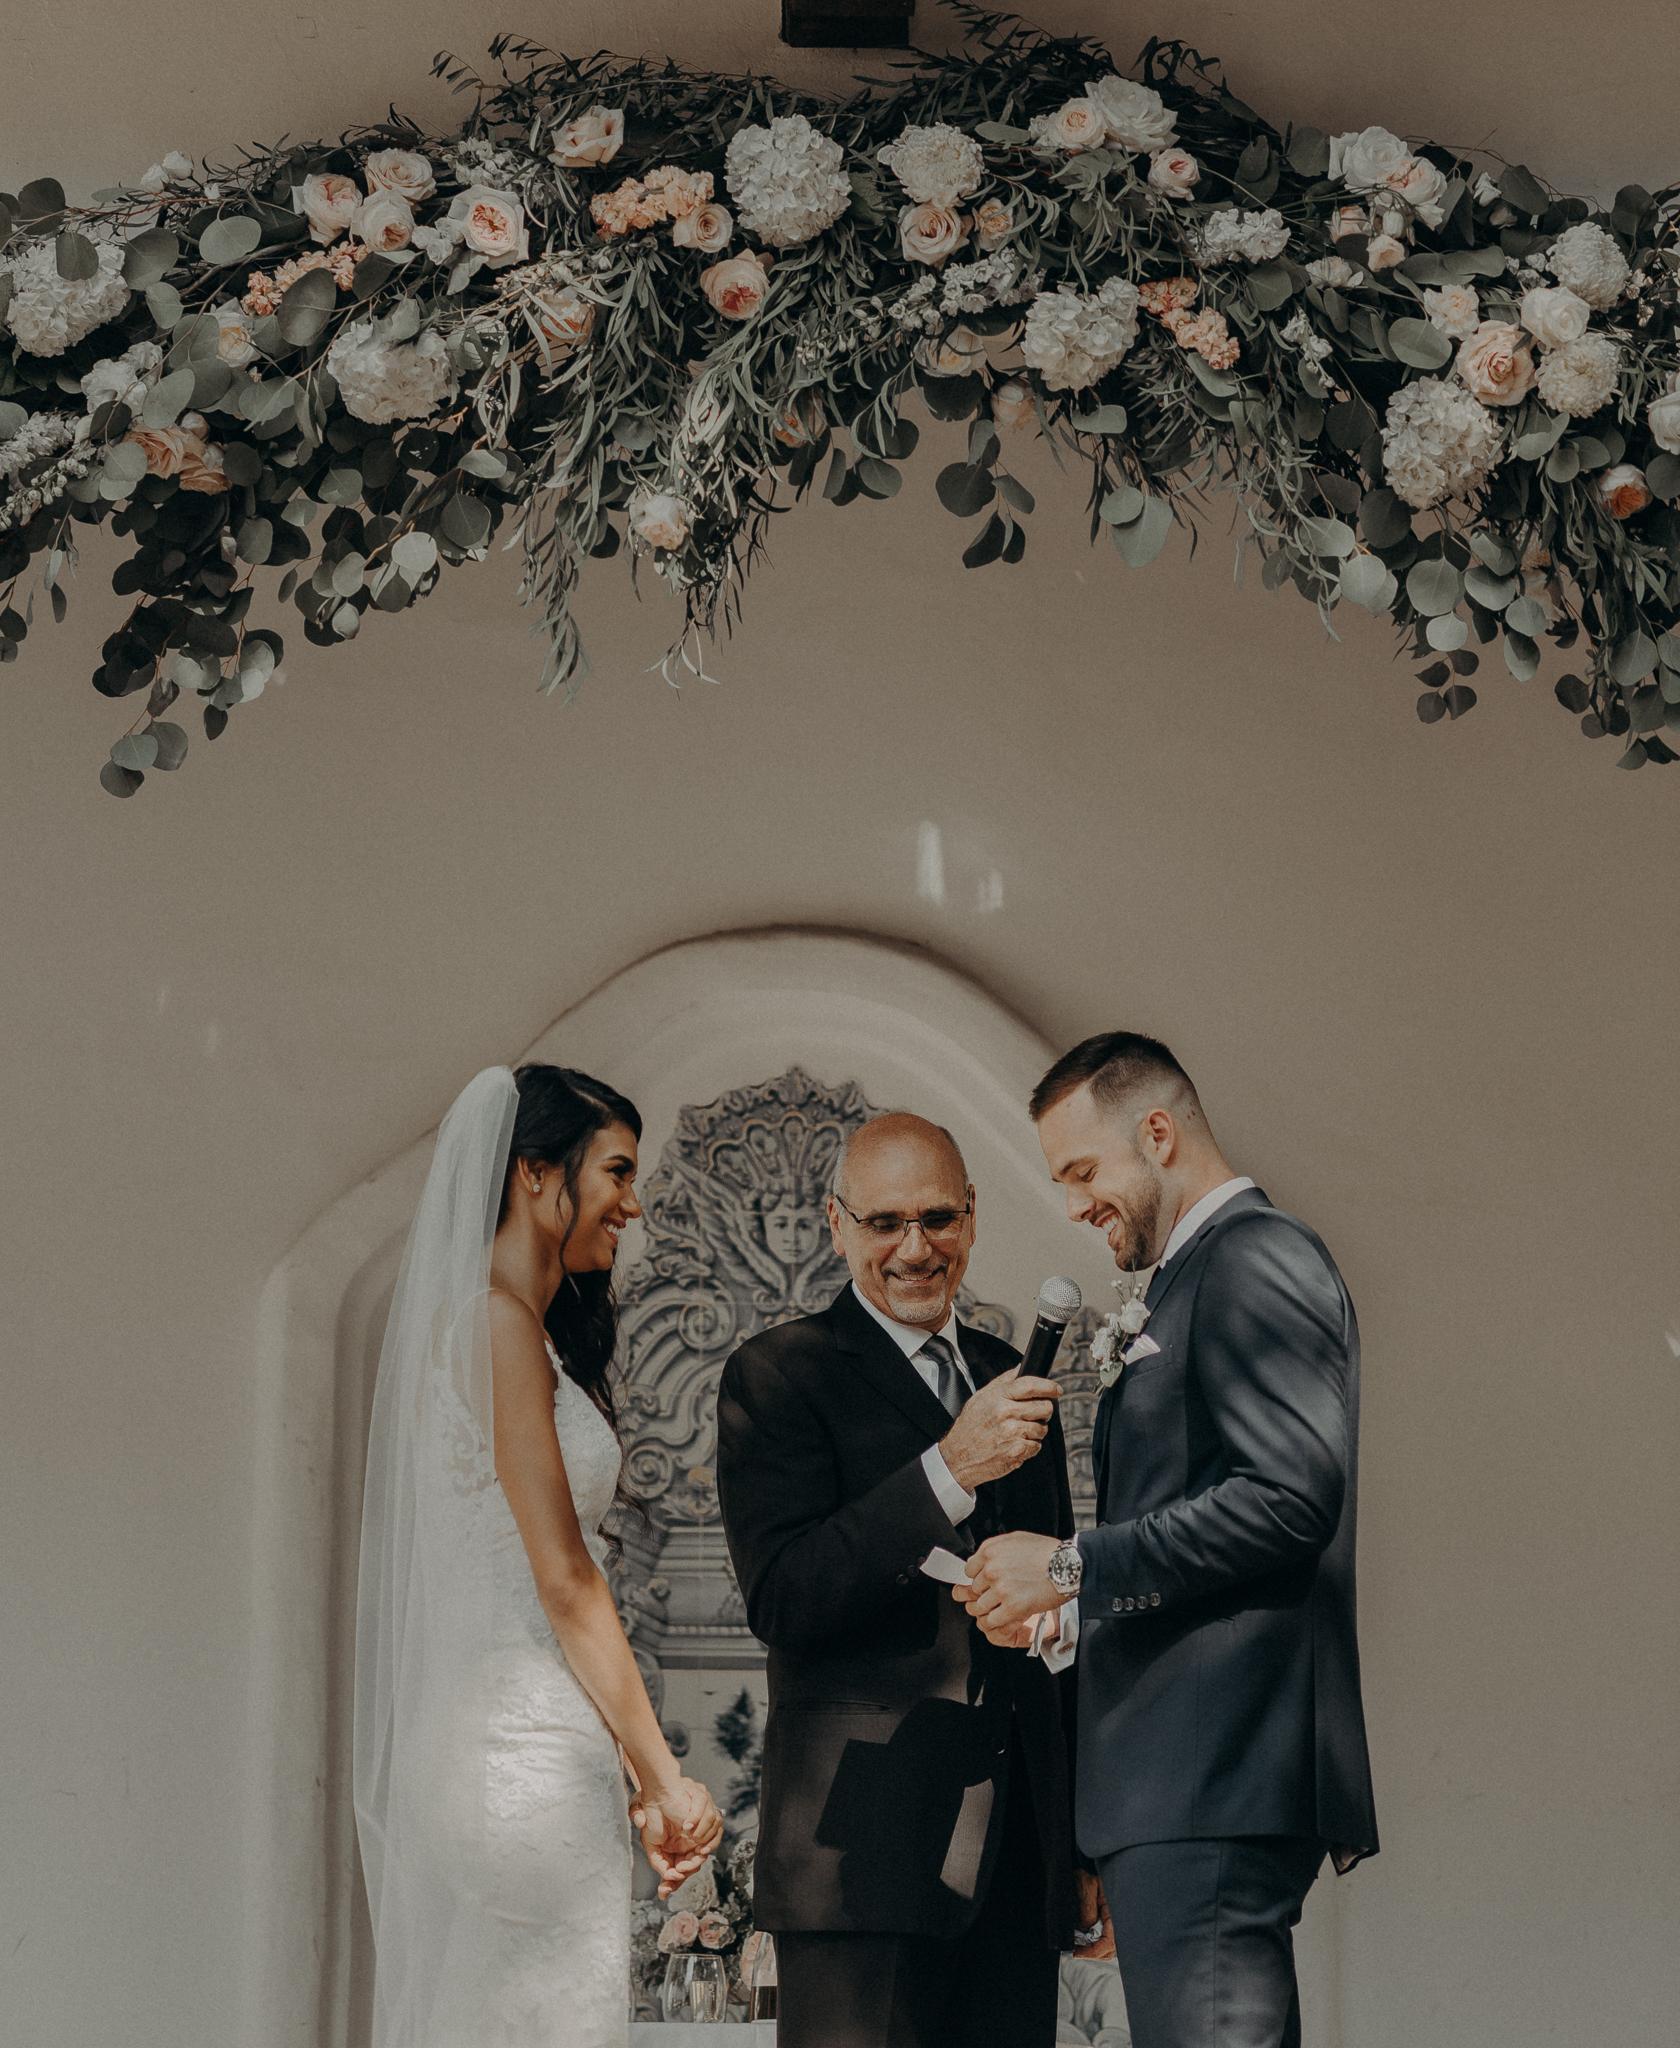 Isaiah + Taylor Photography - Rancho Las Lomas Wedding, Los Angeles Wedding Photographer-052.jpg